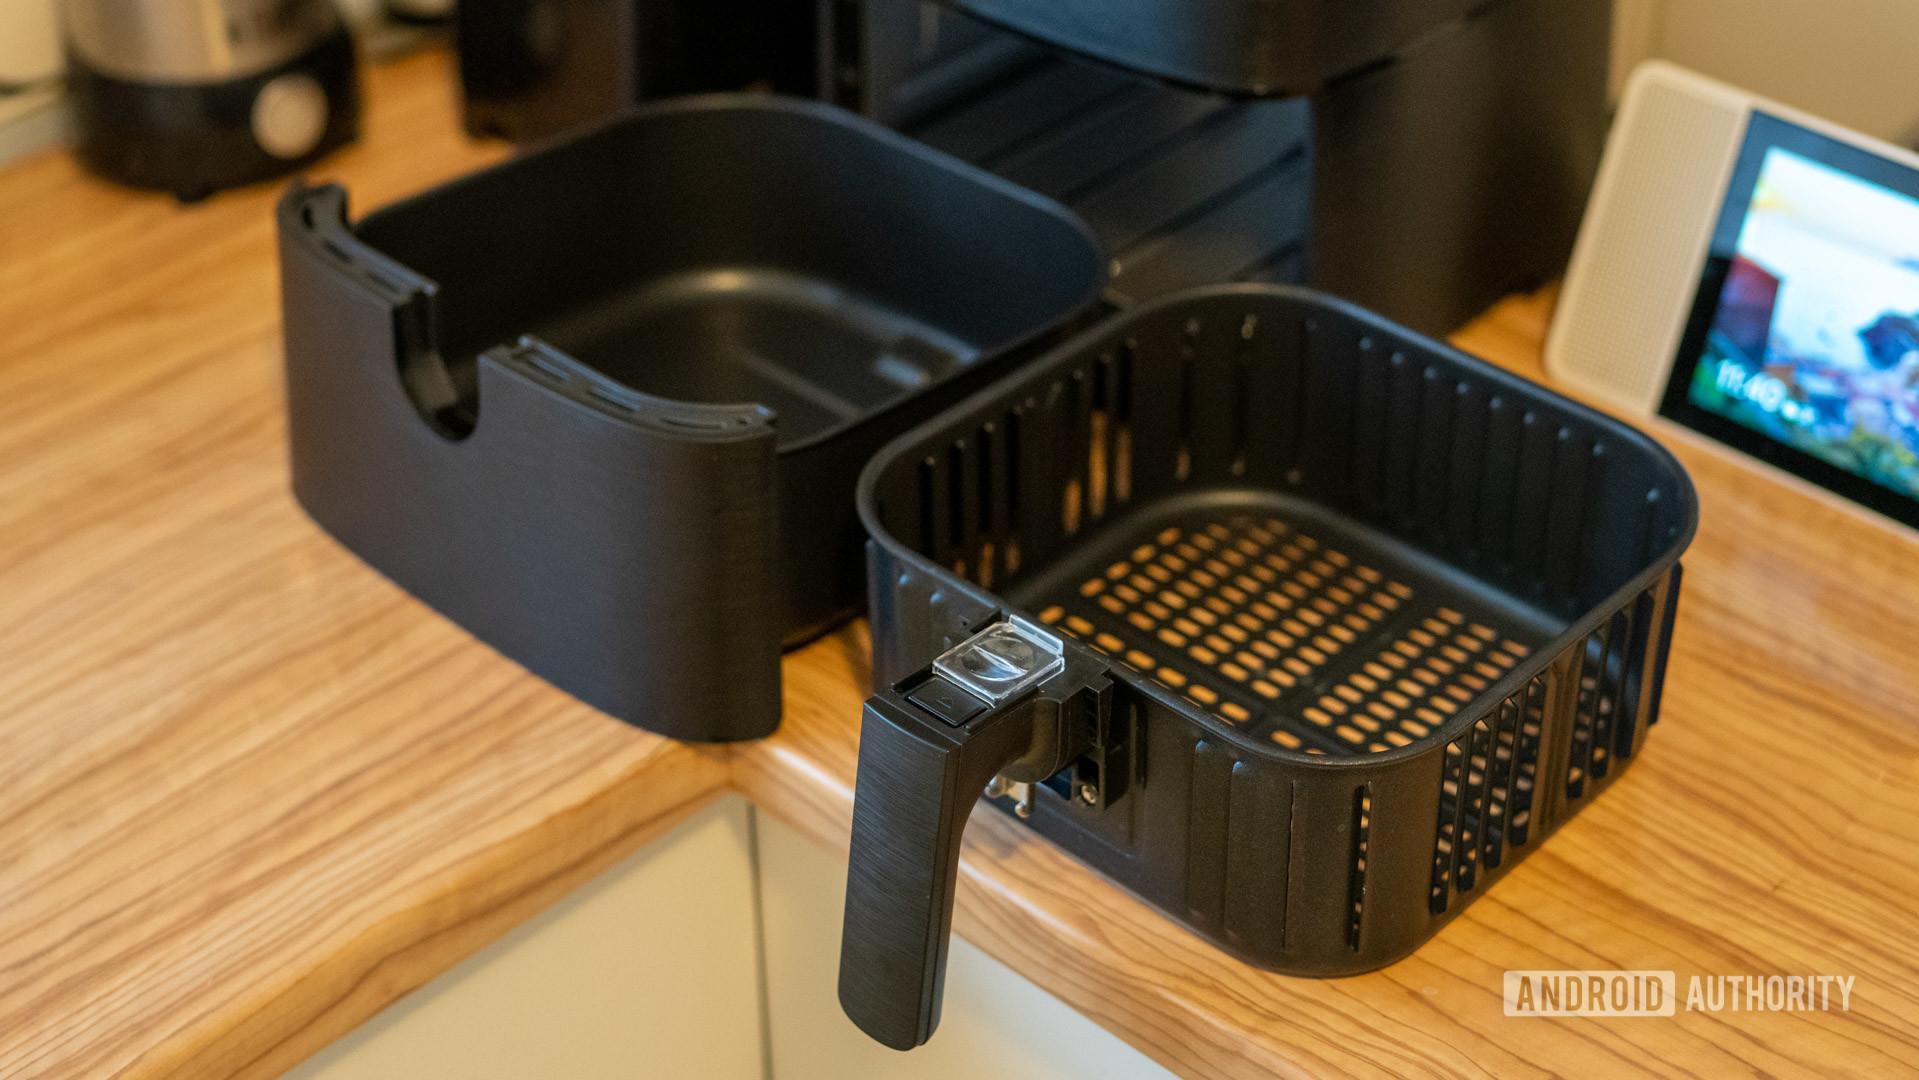 Cosori Smart Air Fryer fryer tray pieces